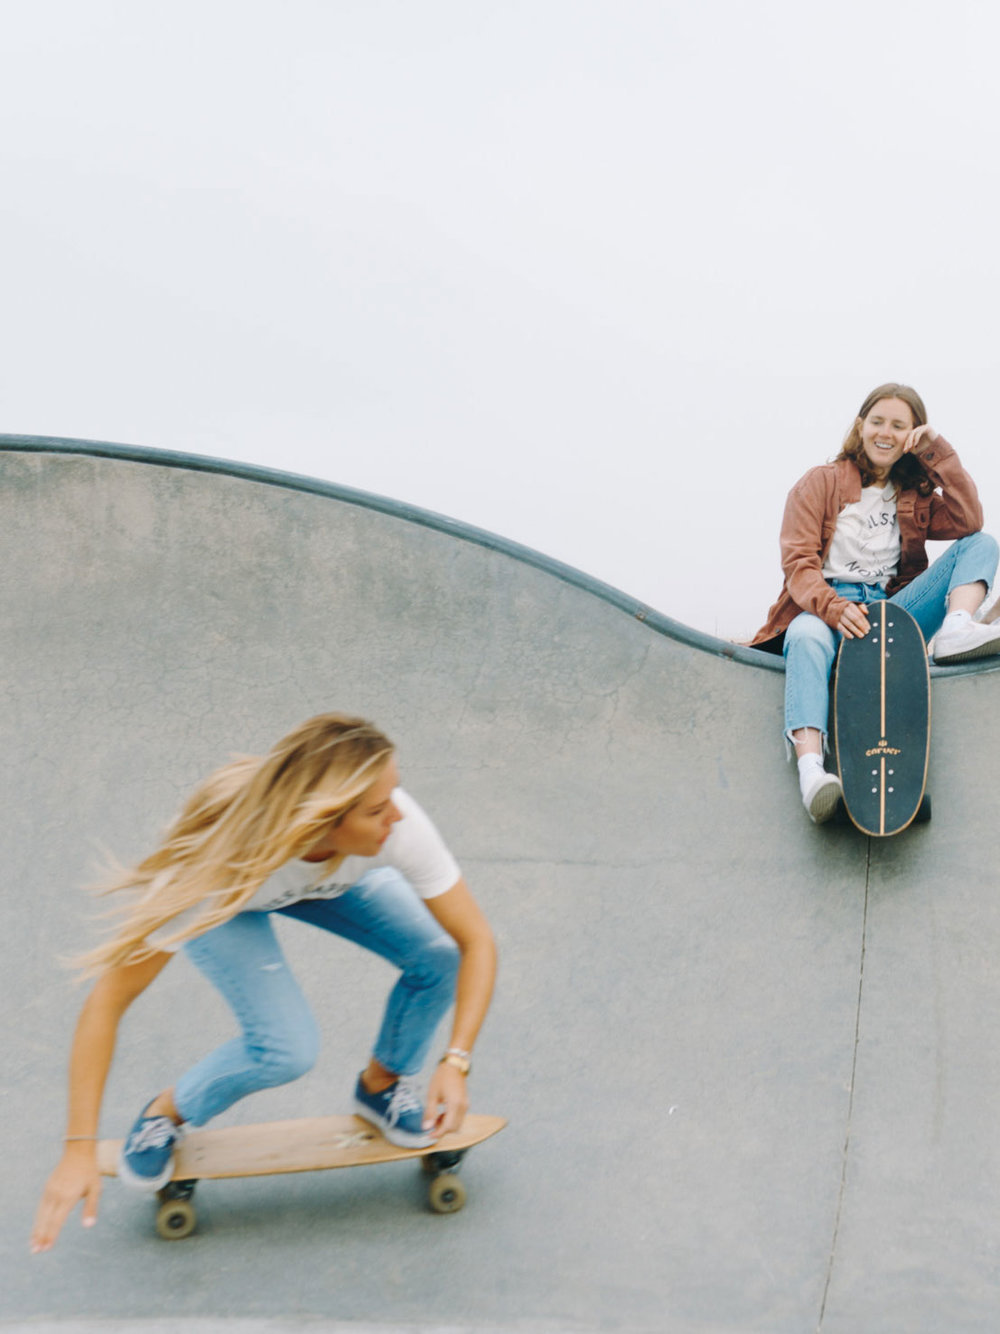 Bliss And Mischief x Grl Swirl-Boardwalk 'Bliss' Slim Tee